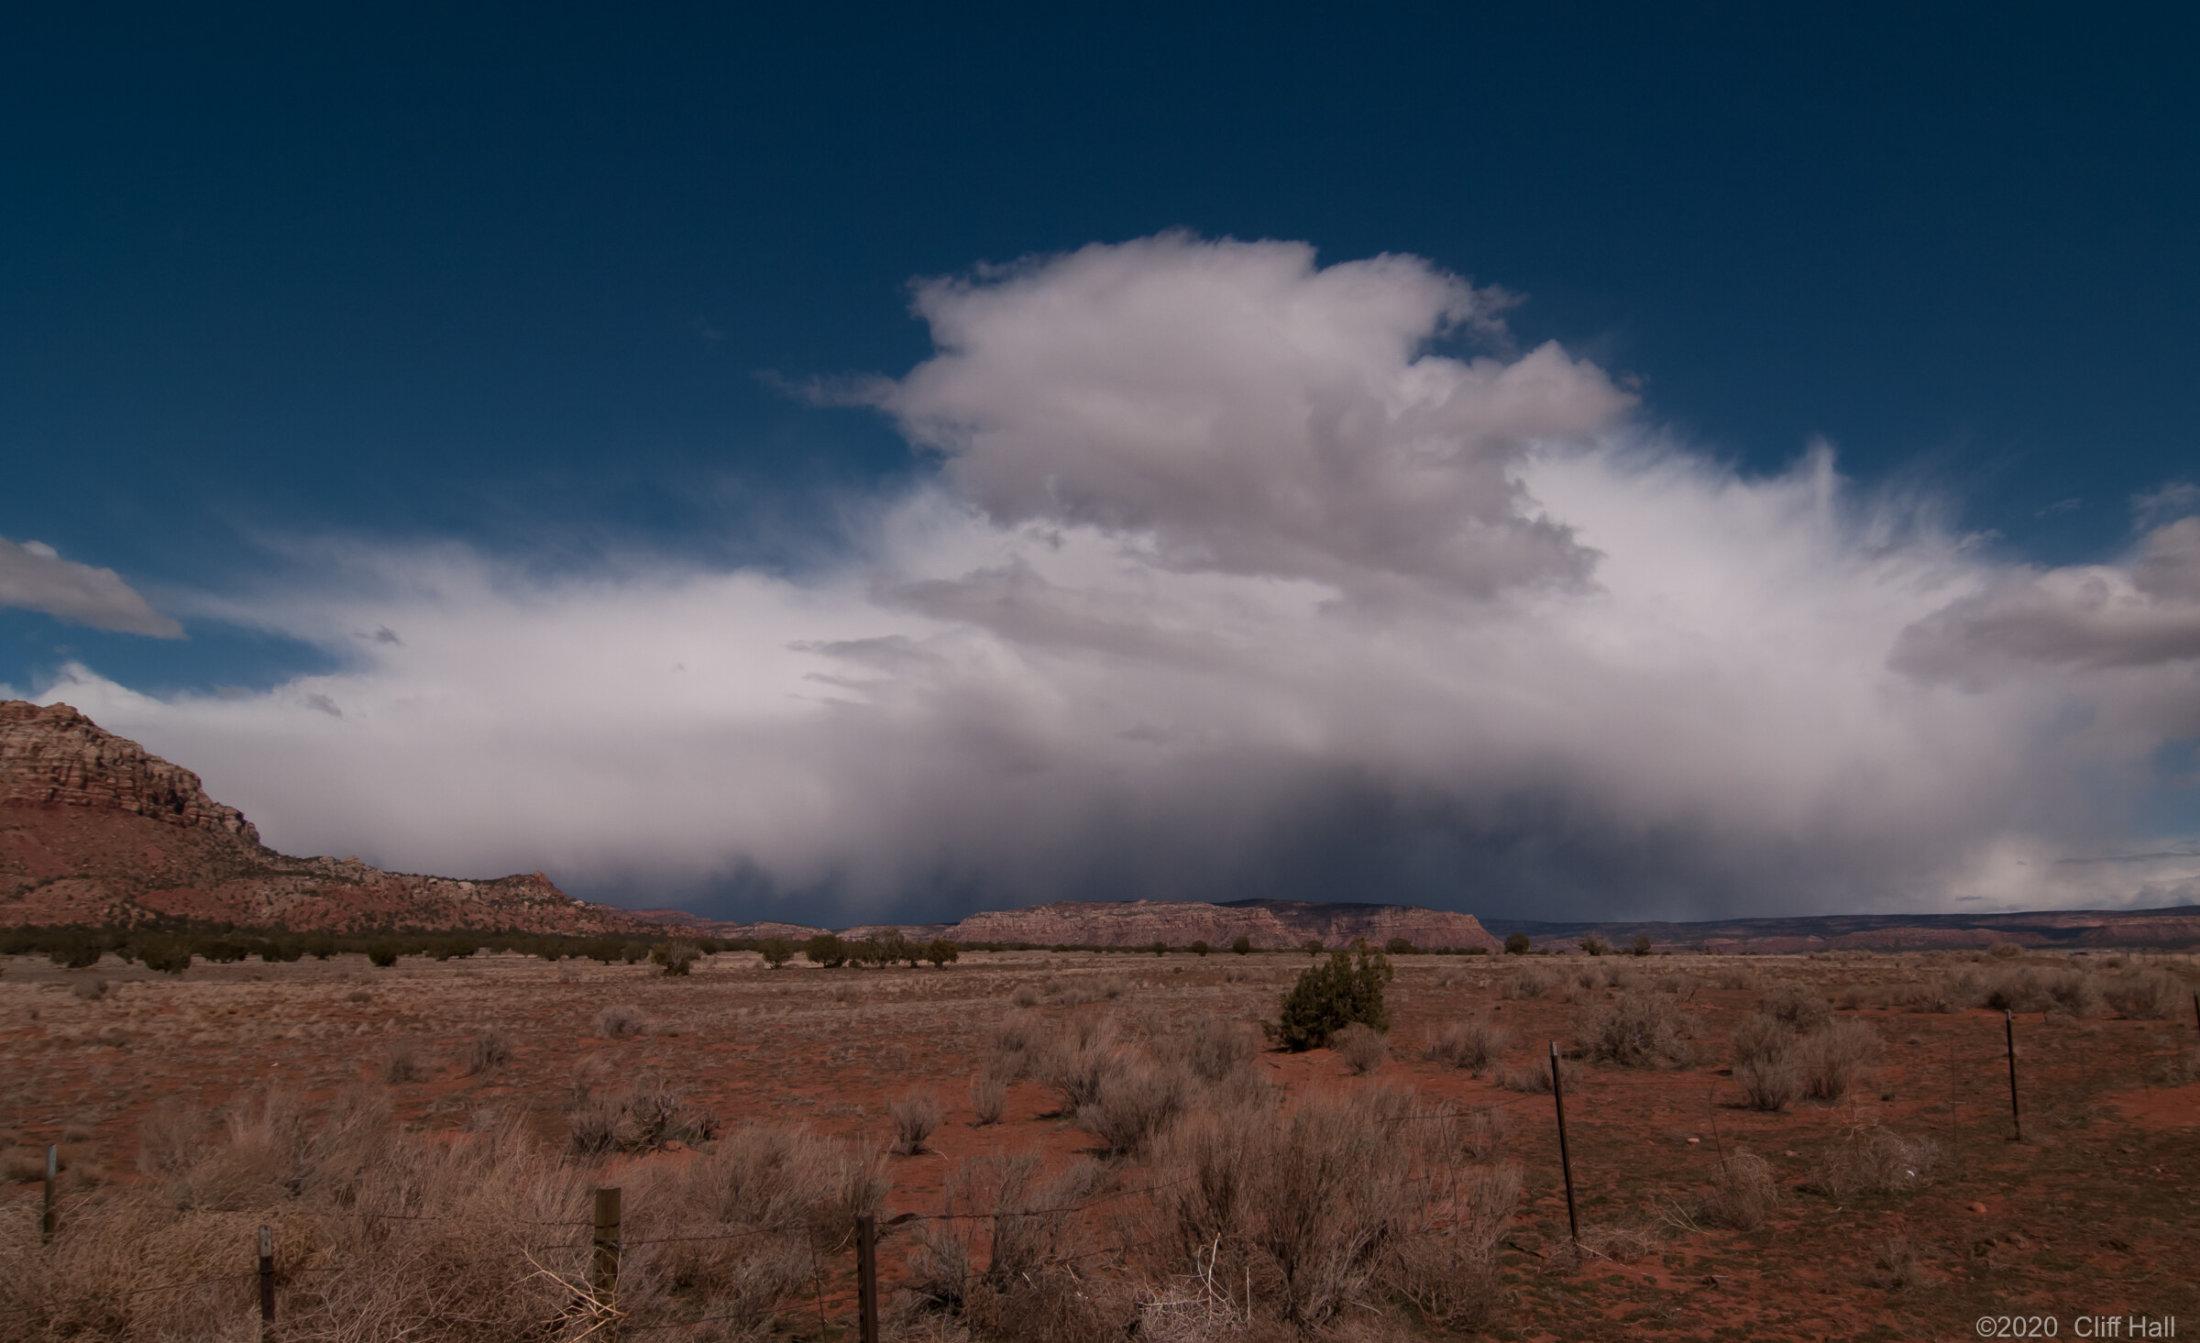 Storm over Cane Beds, AZ